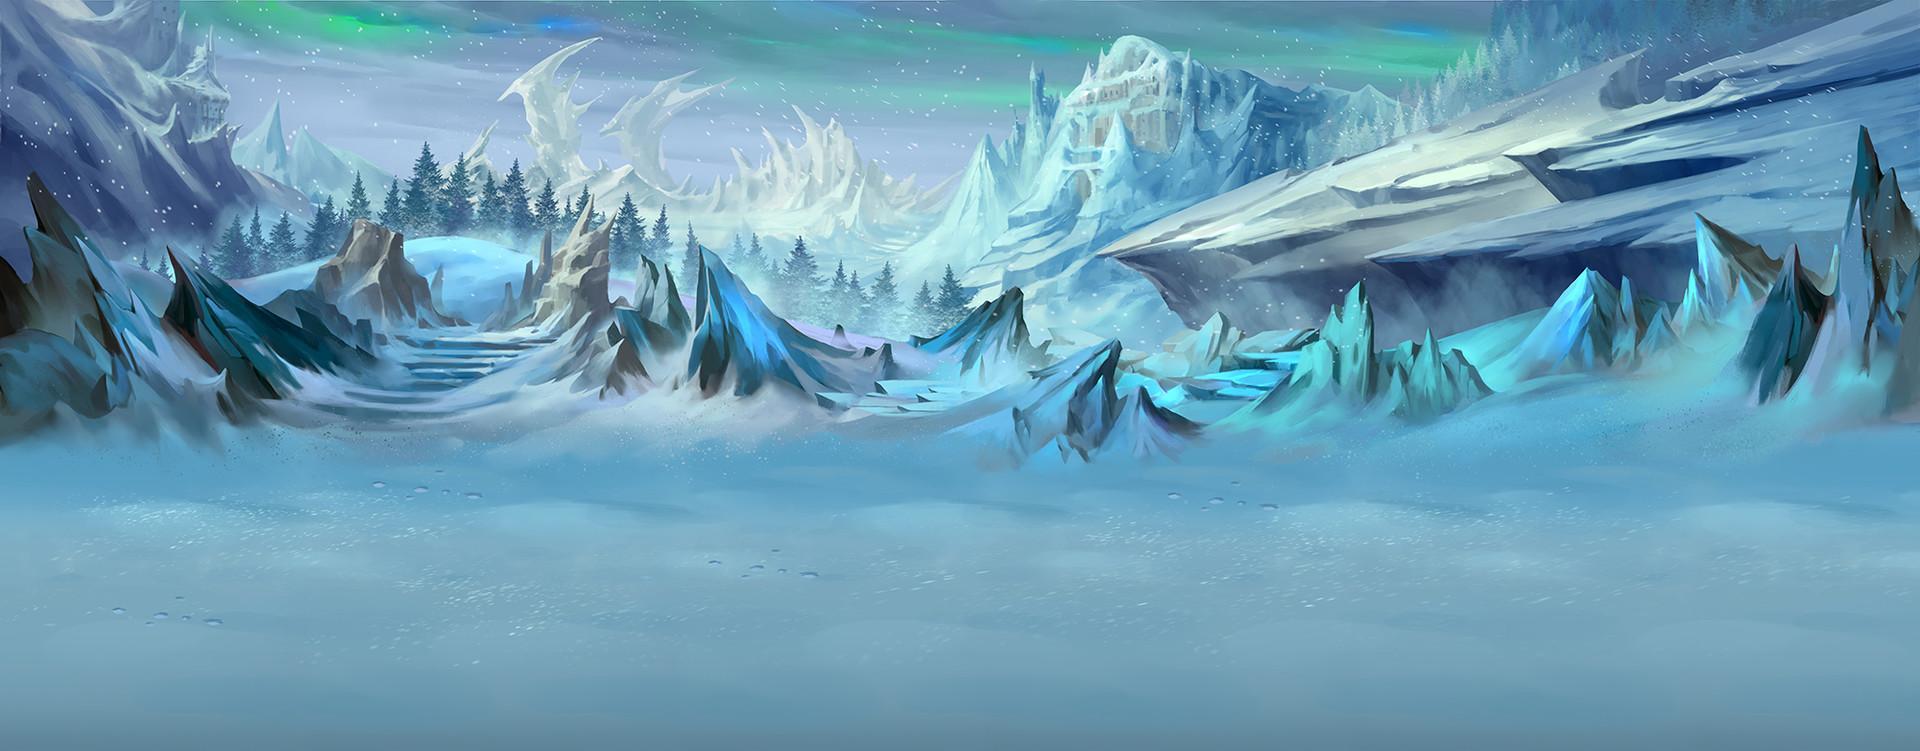 Trung nguyen winter bg